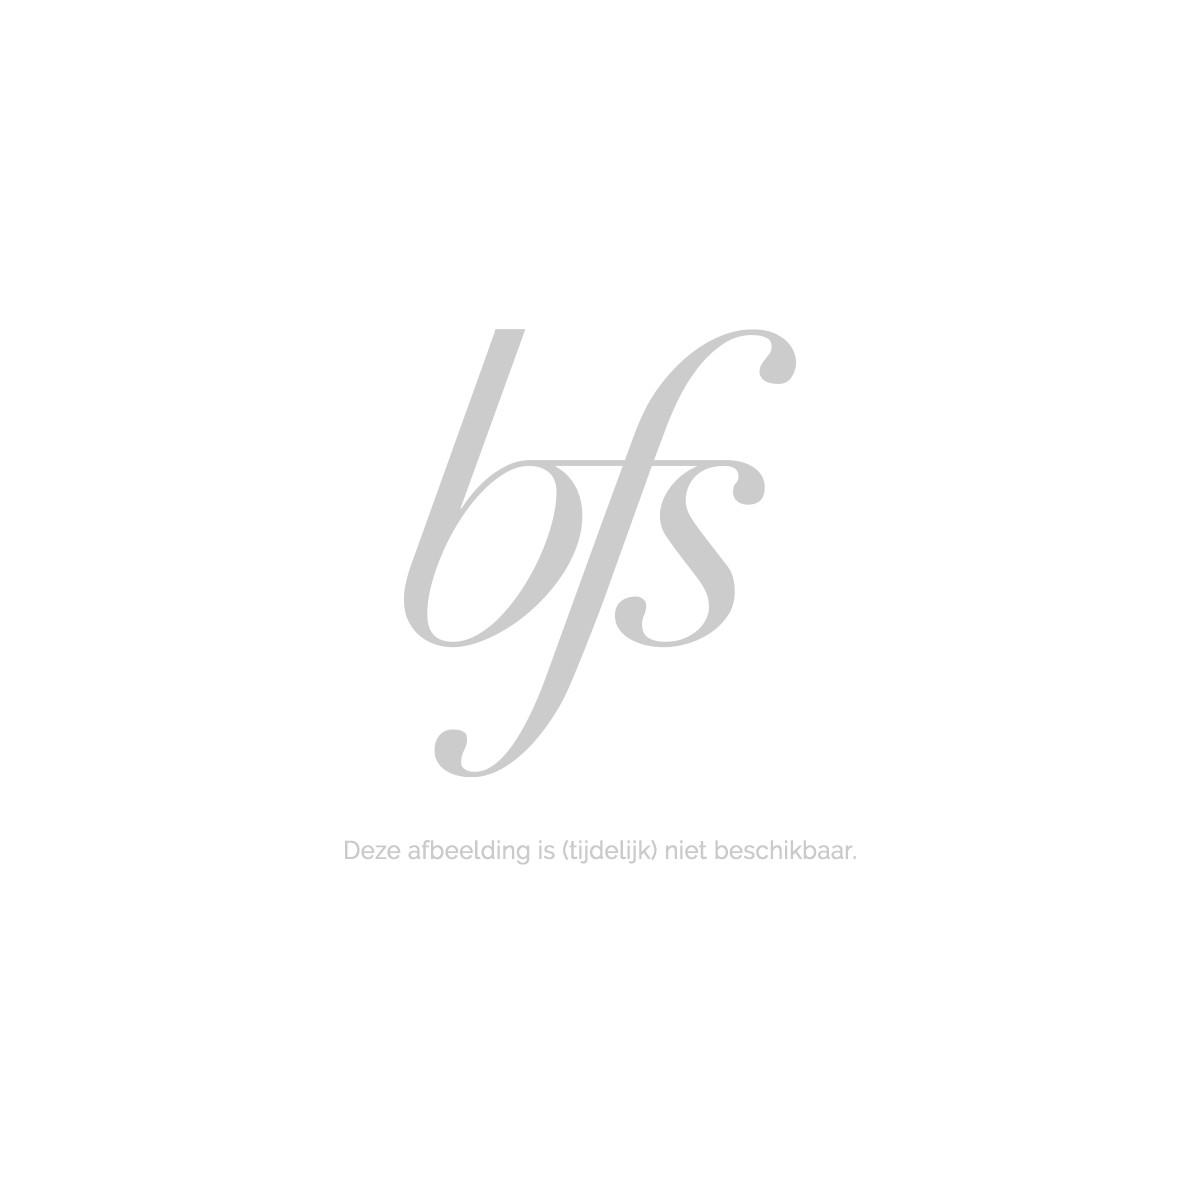 Beardburys Hygienizer Met Aloe Vera In Pompflacon 500 Ml